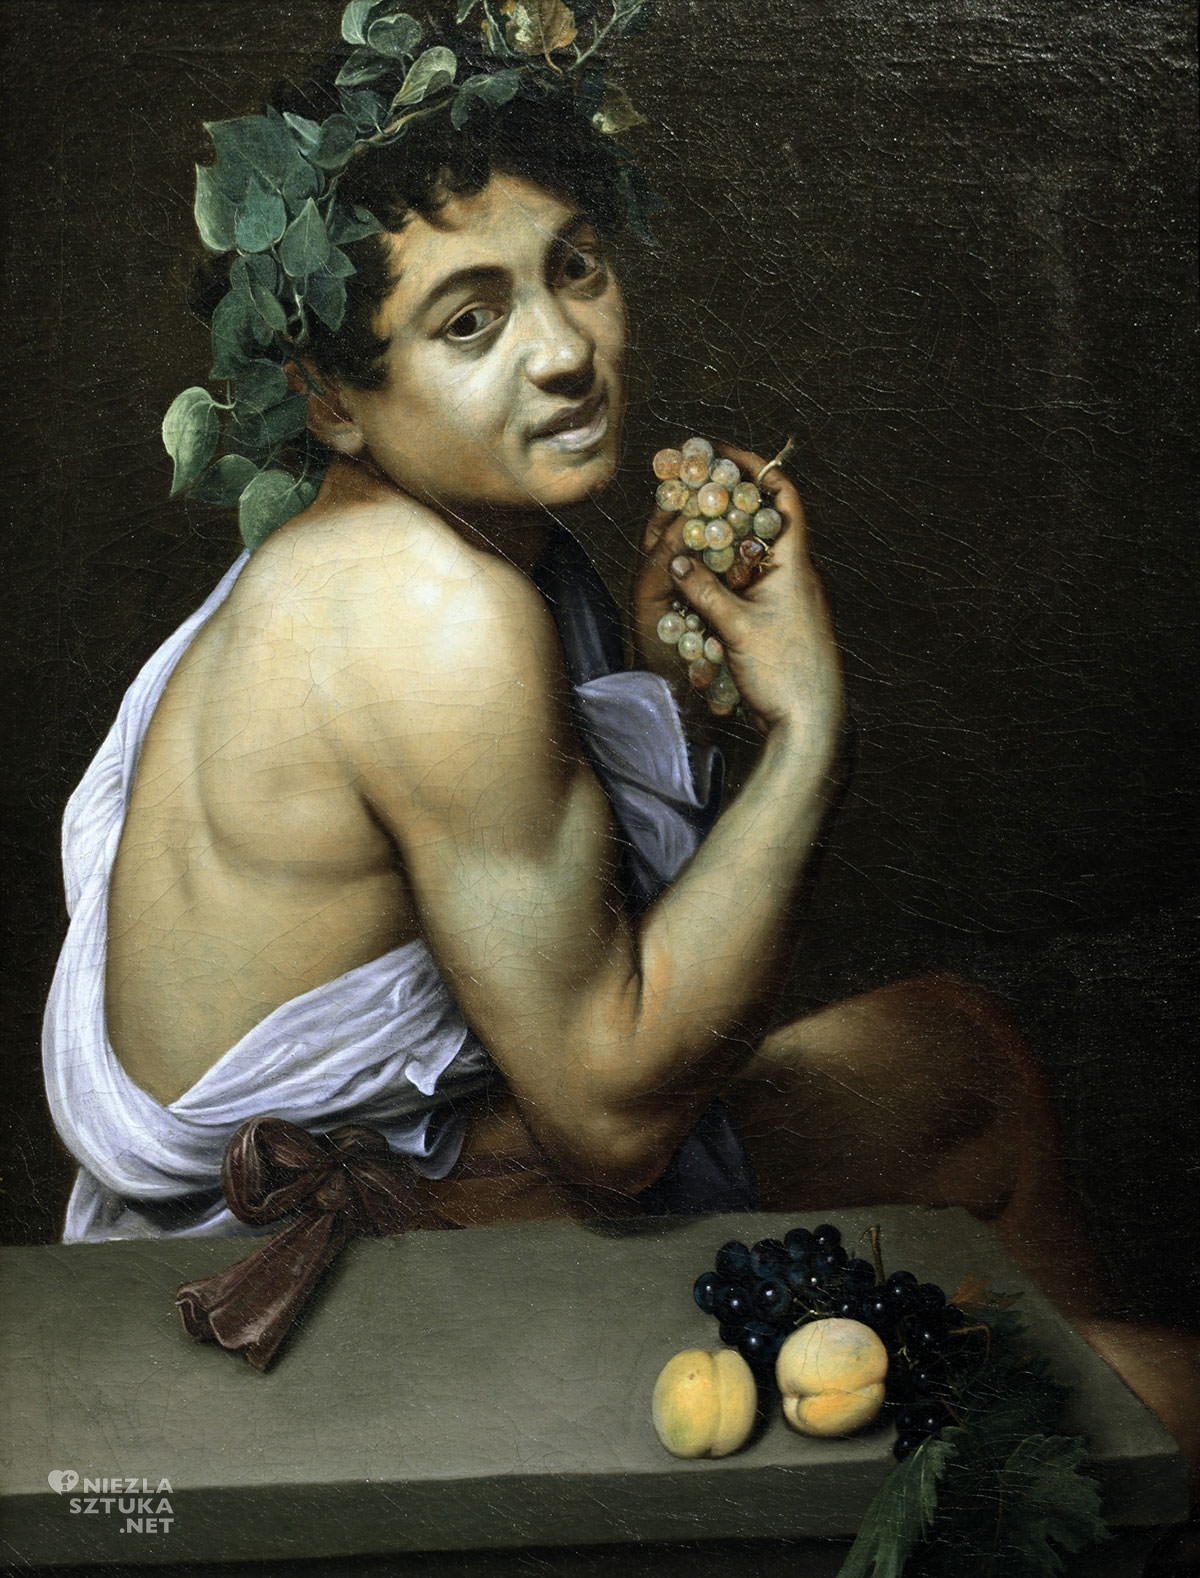 Caravaggio, Chory Bachus, autoportret, Niezła sztuka